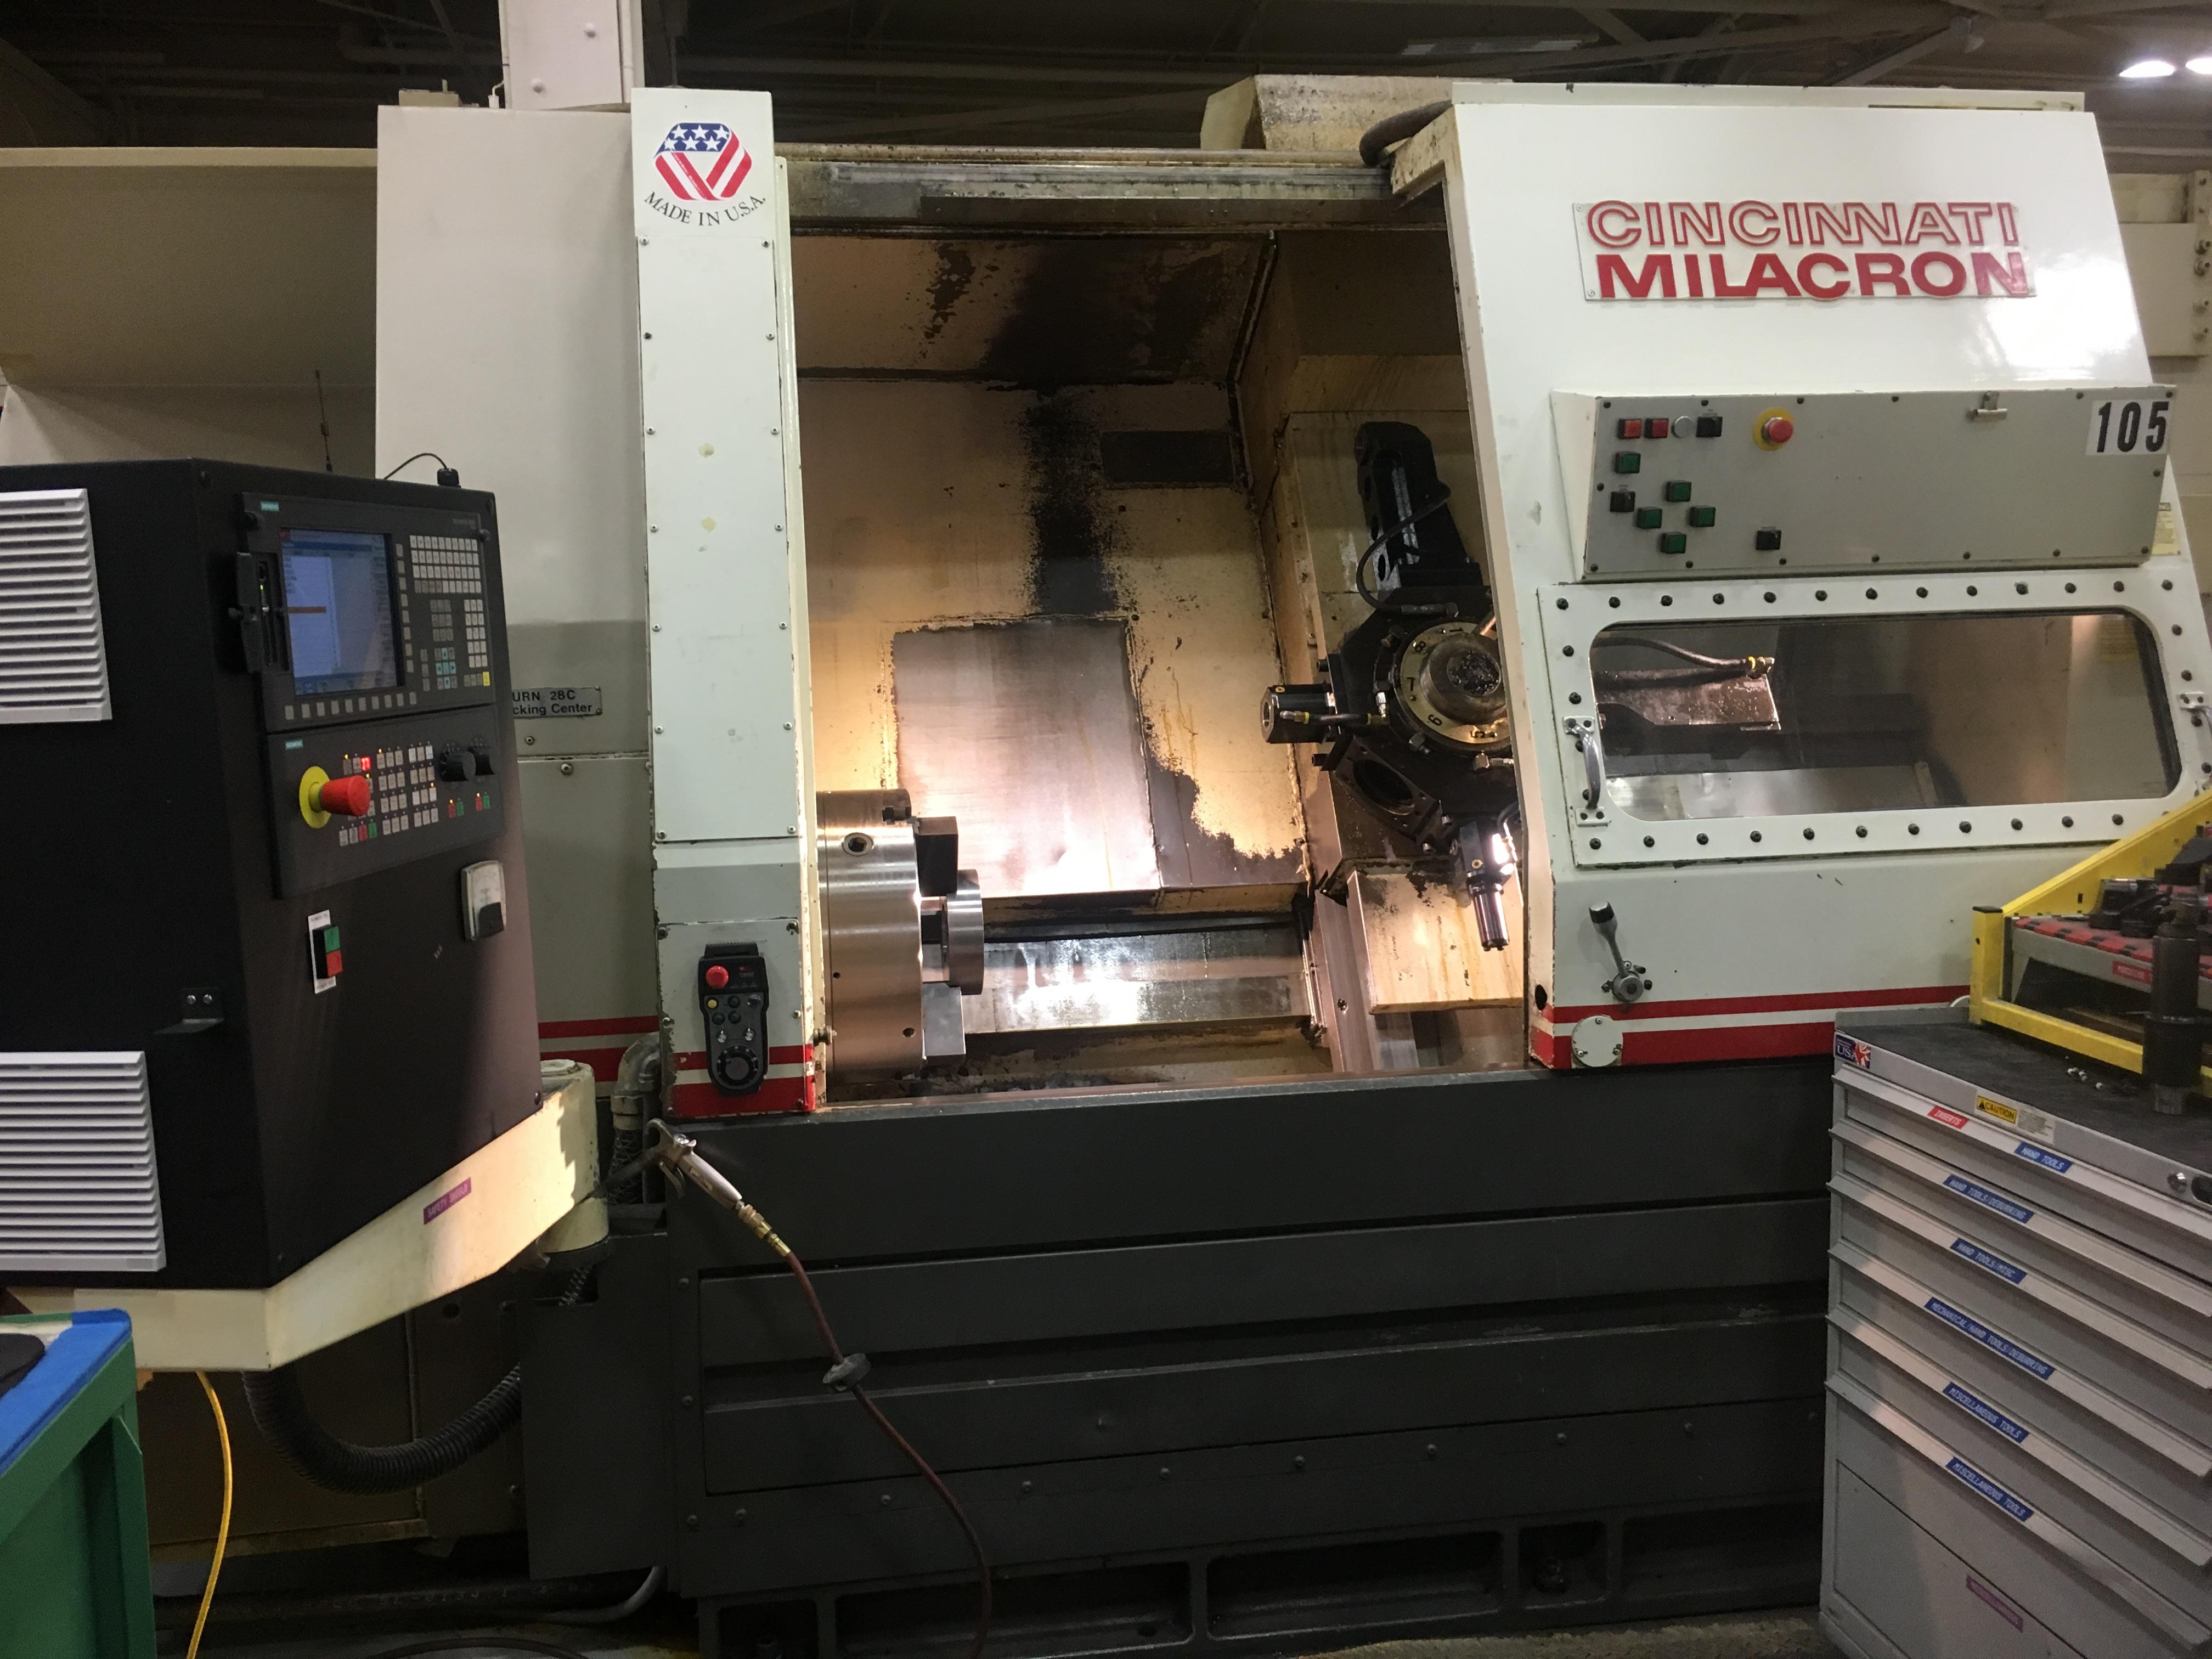 Cincinnati Milacron Lathe – Siemens 828D